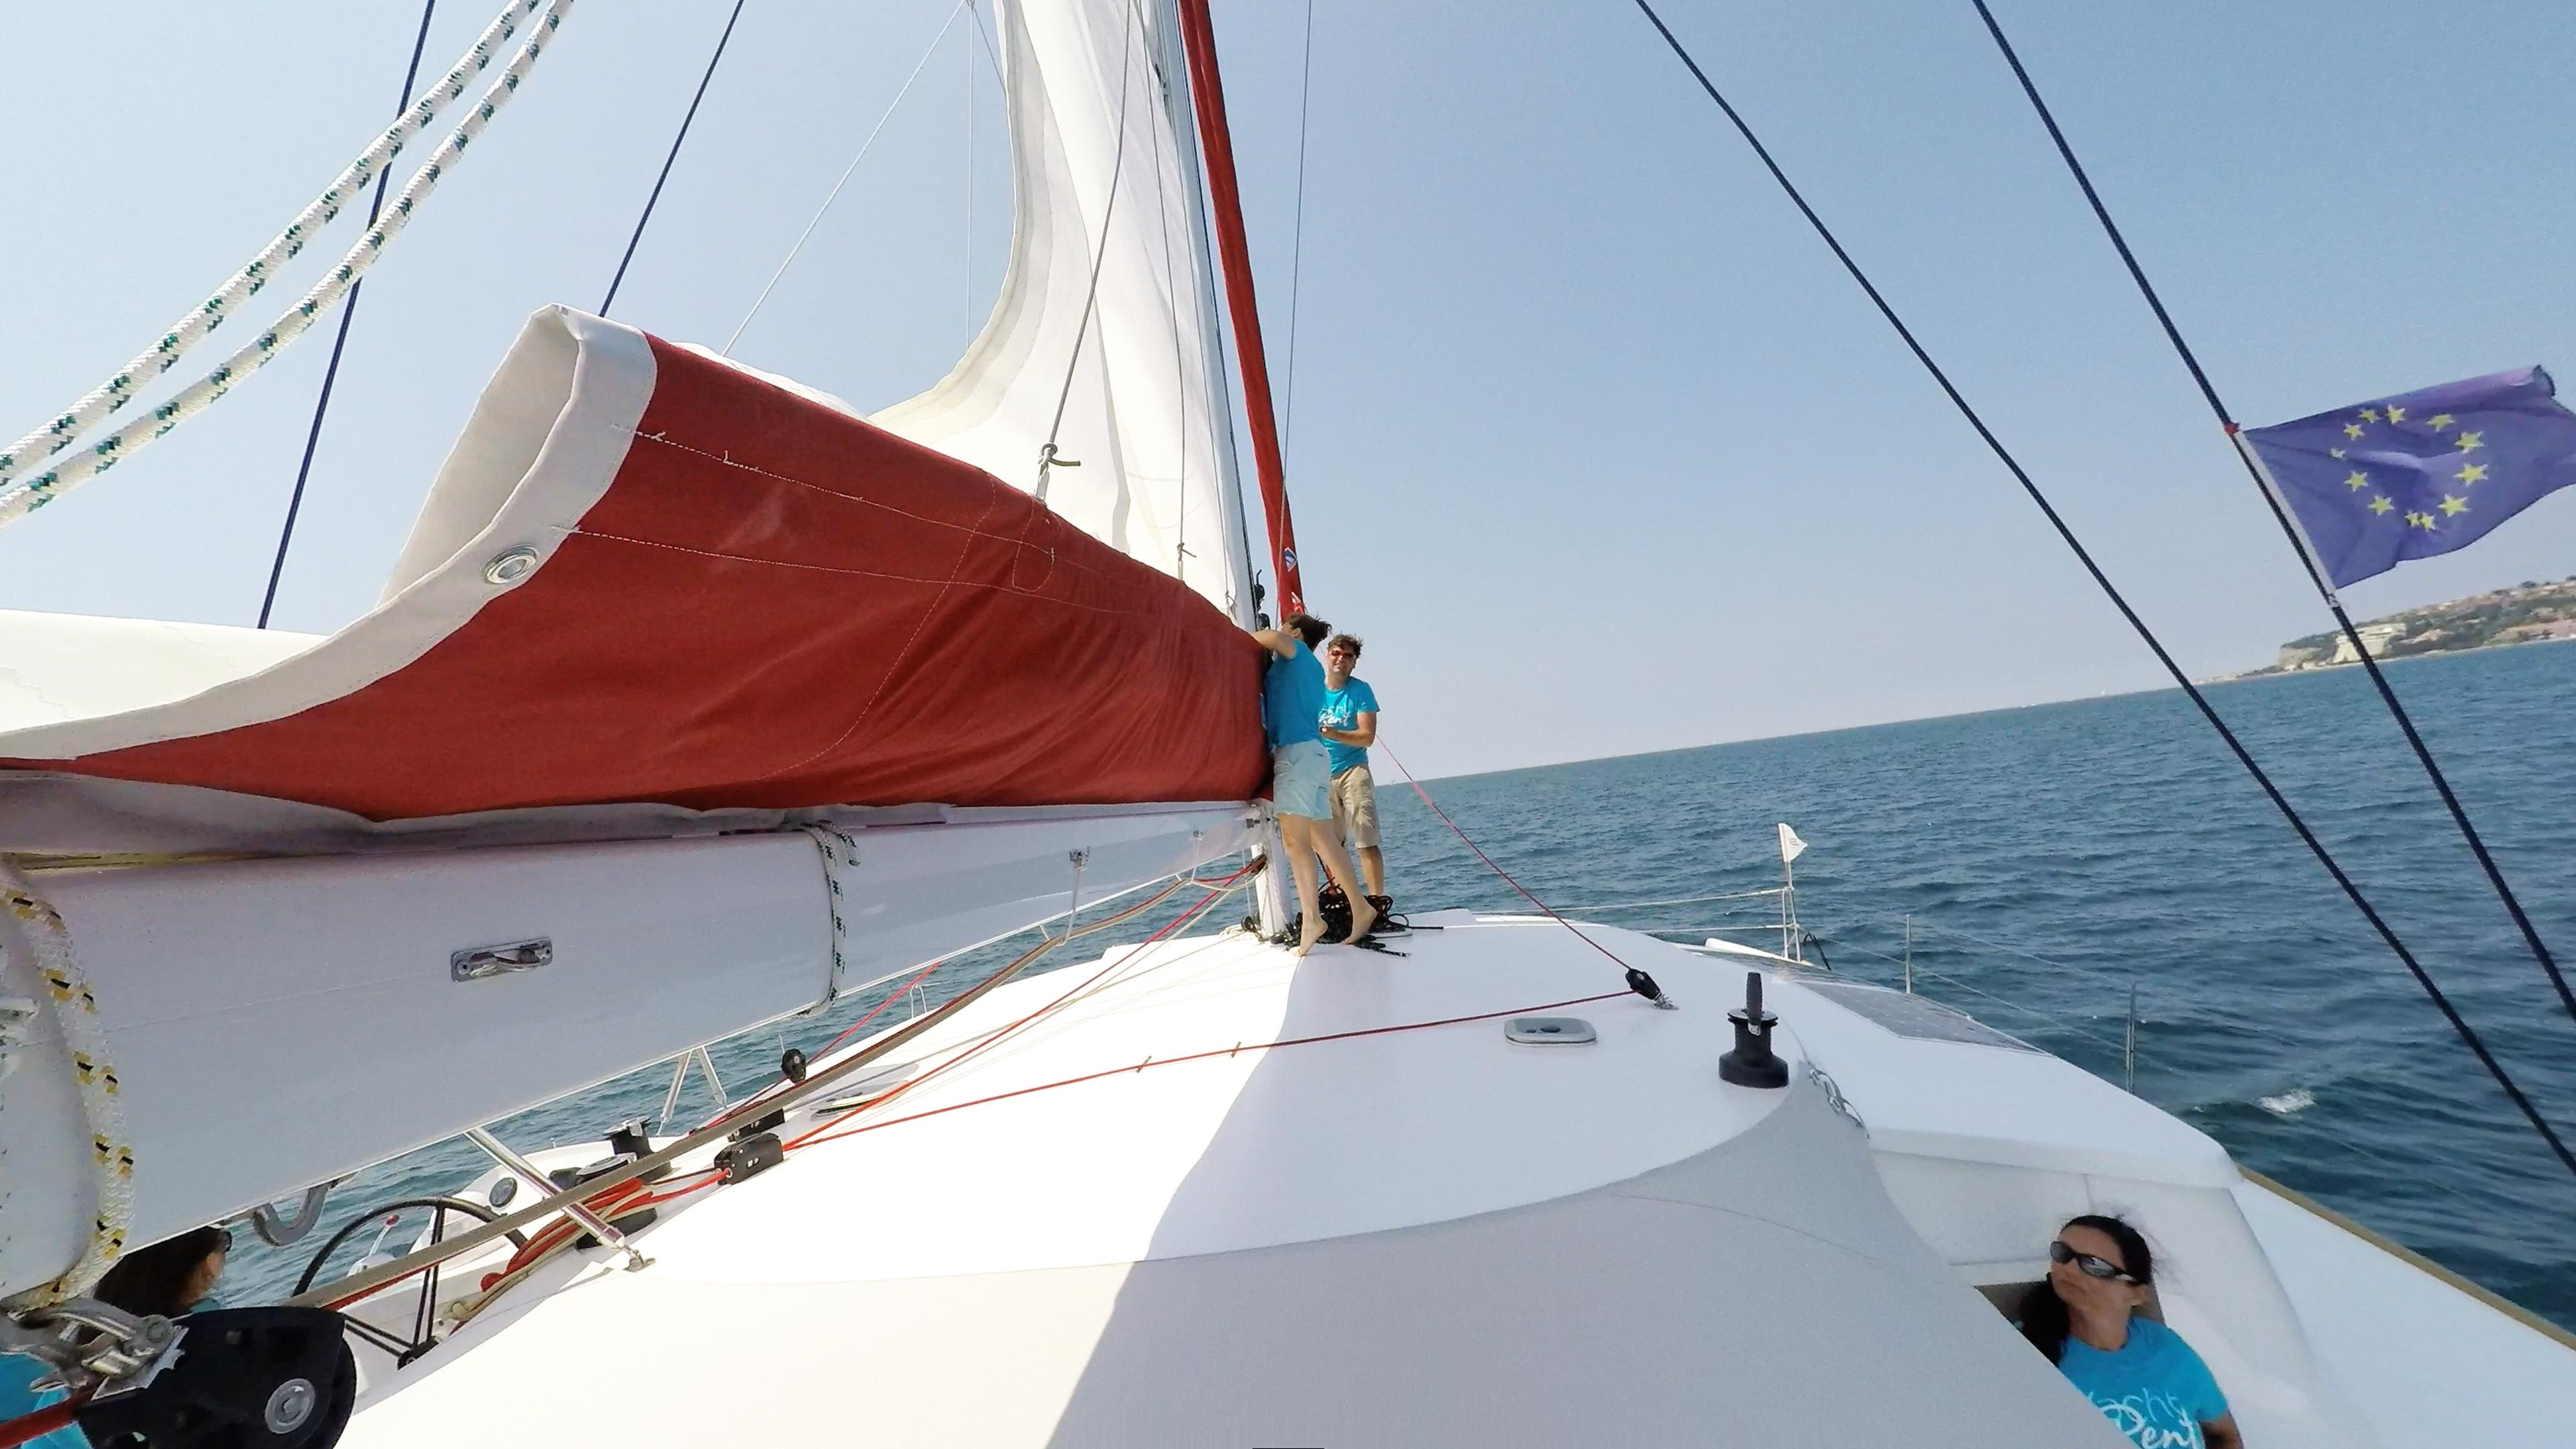 equipaggio hoisting randa barca a vela trimarano neel 45